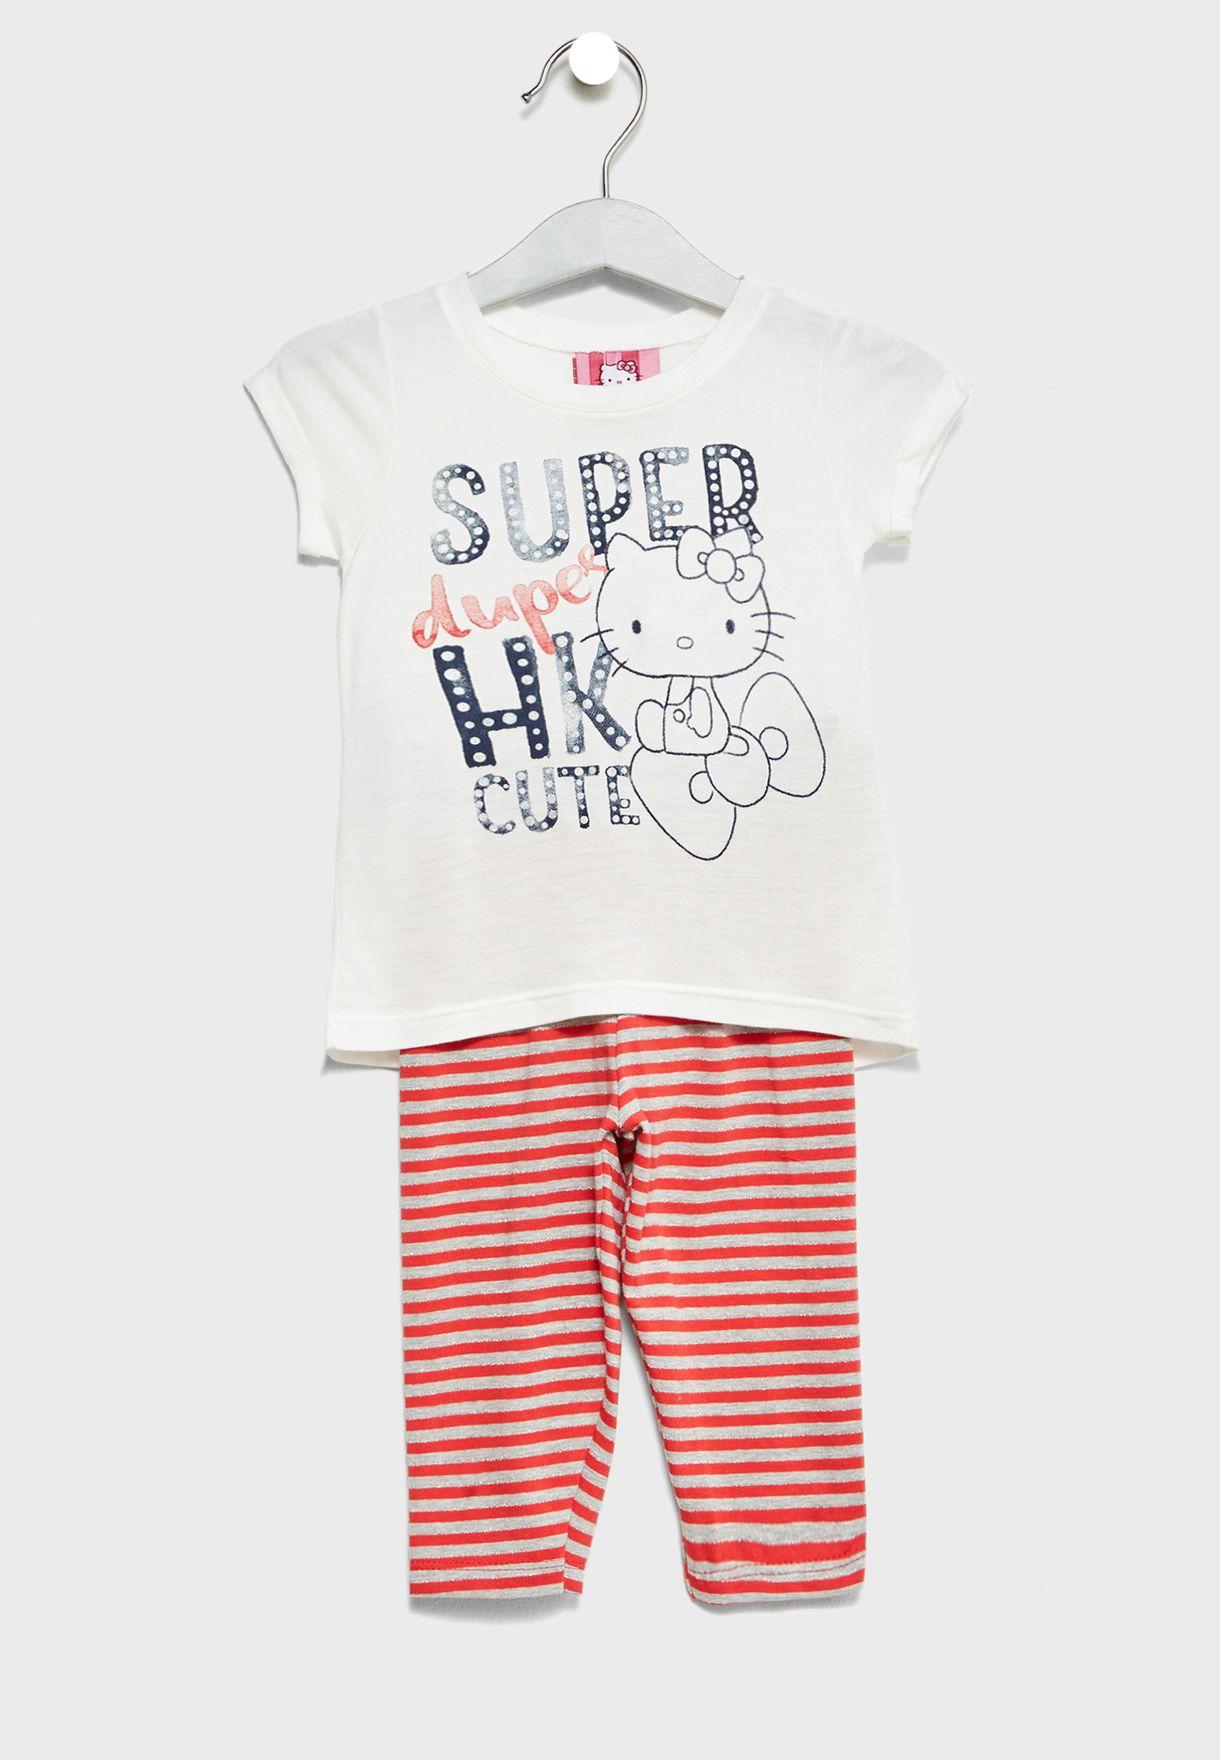 a66cdc167cbe26 Shop Hello Kitty multicolor Little Top + Leggings Set 87728 for Kids ...